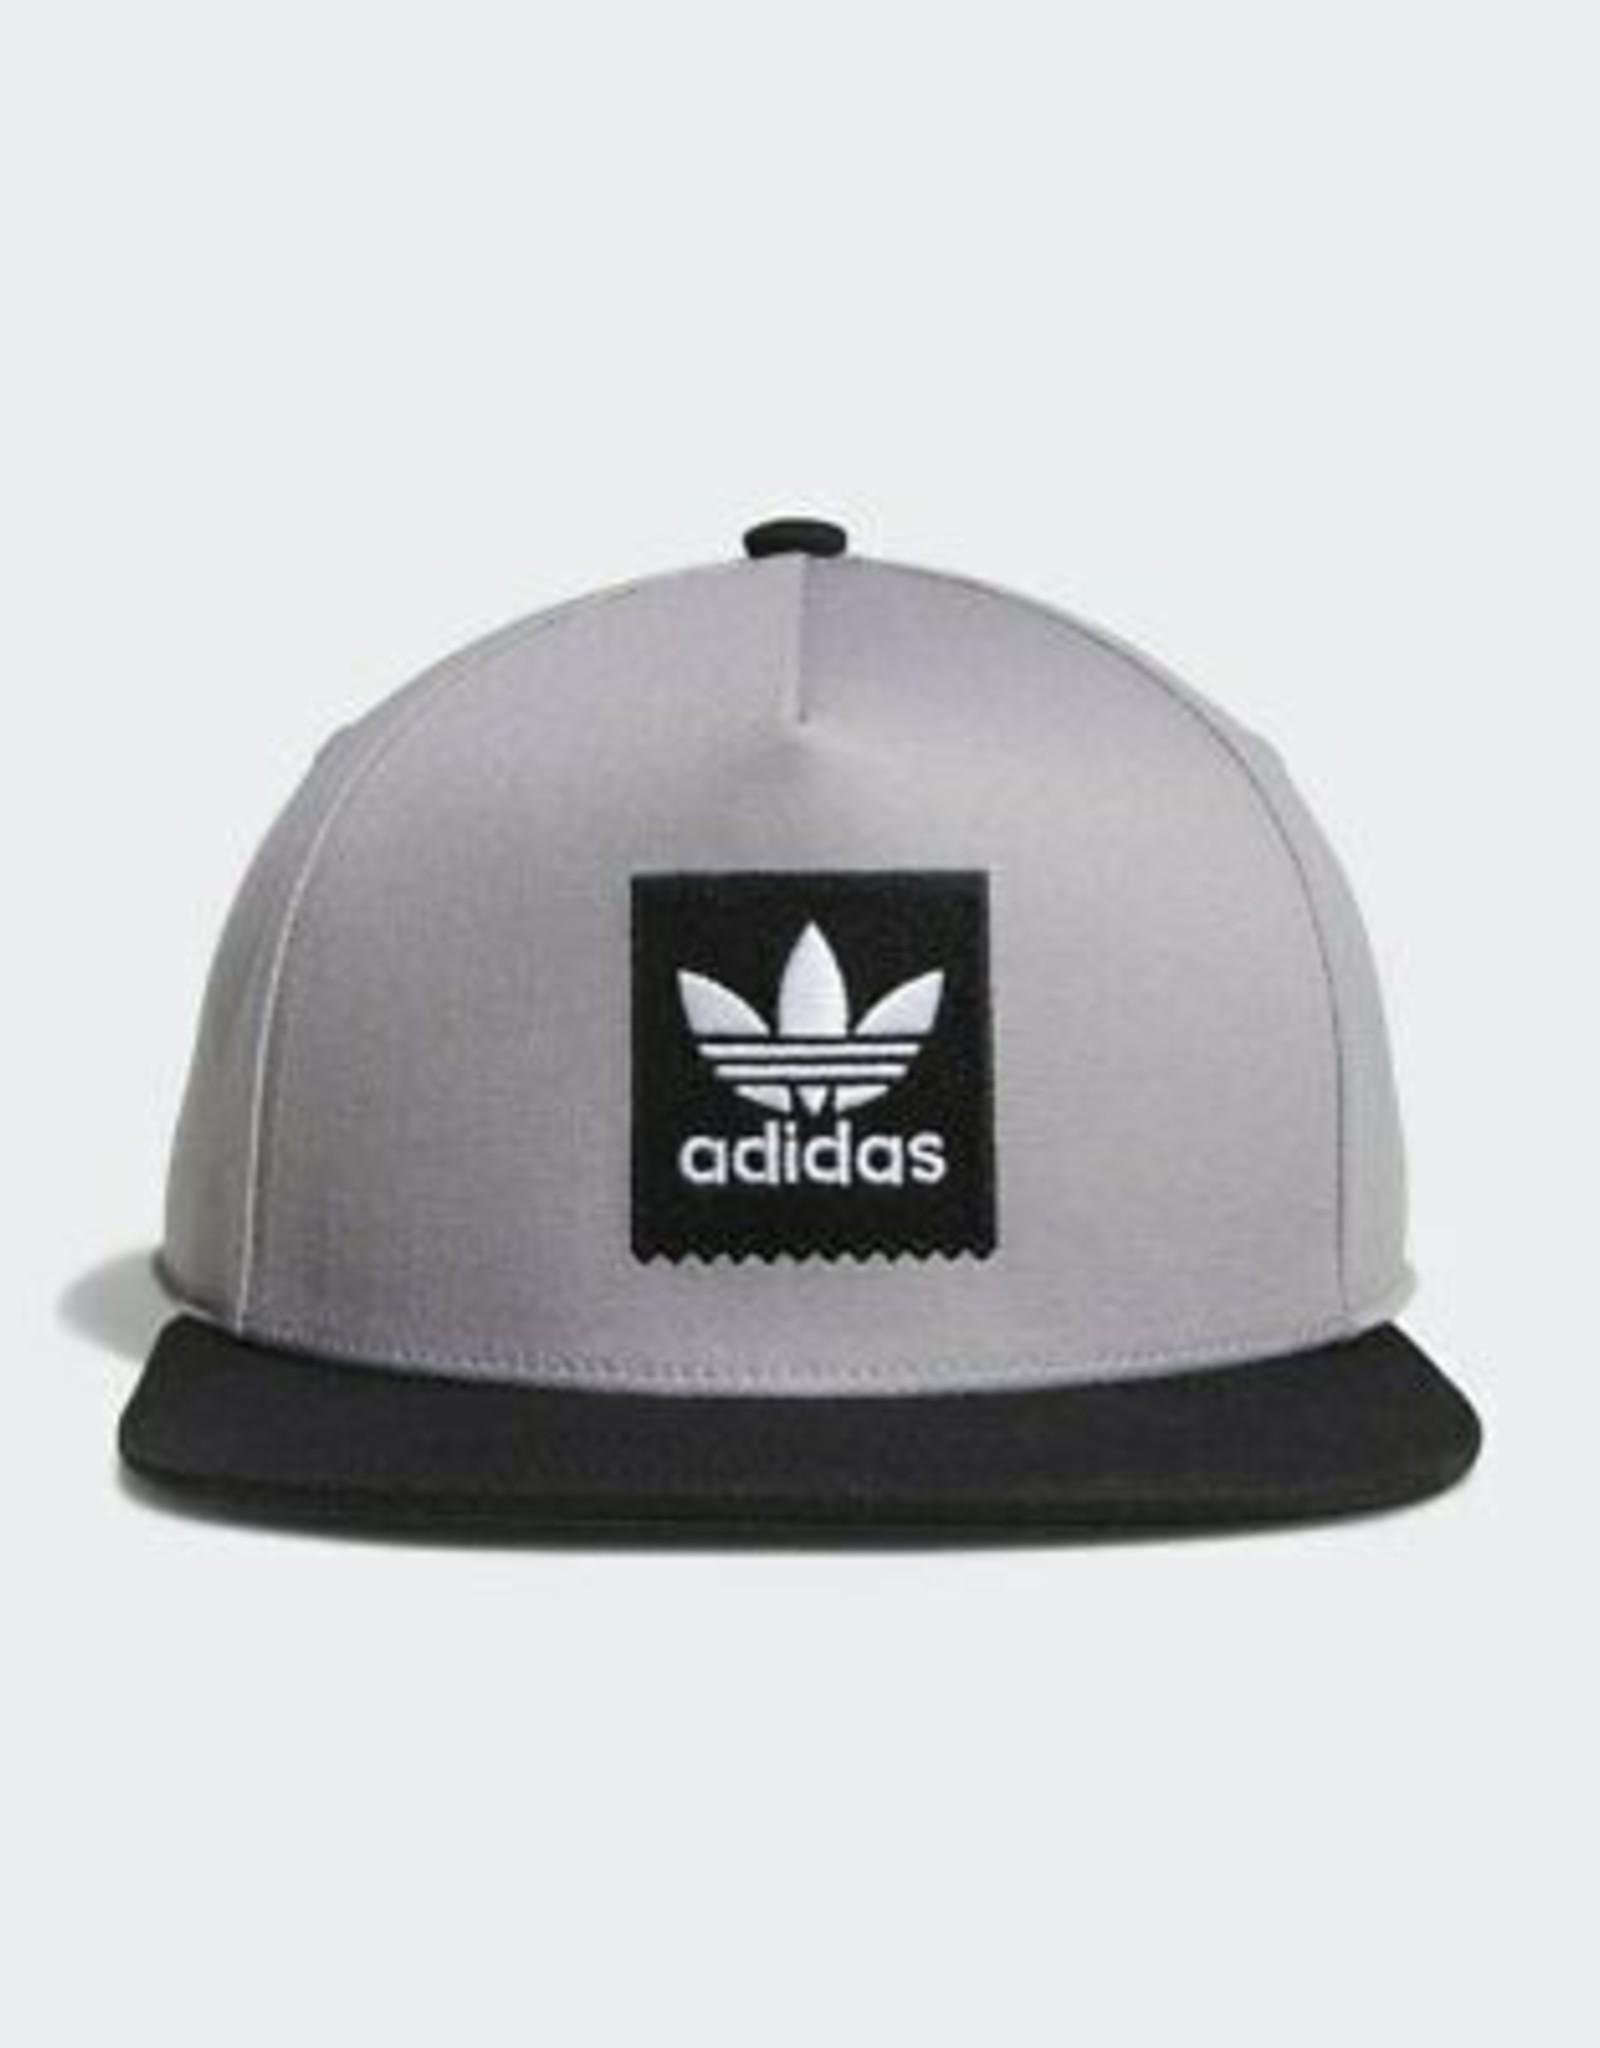 ADIDAS ADIDAS 2TONE SNAPBACK HAT - GREY/BLACK